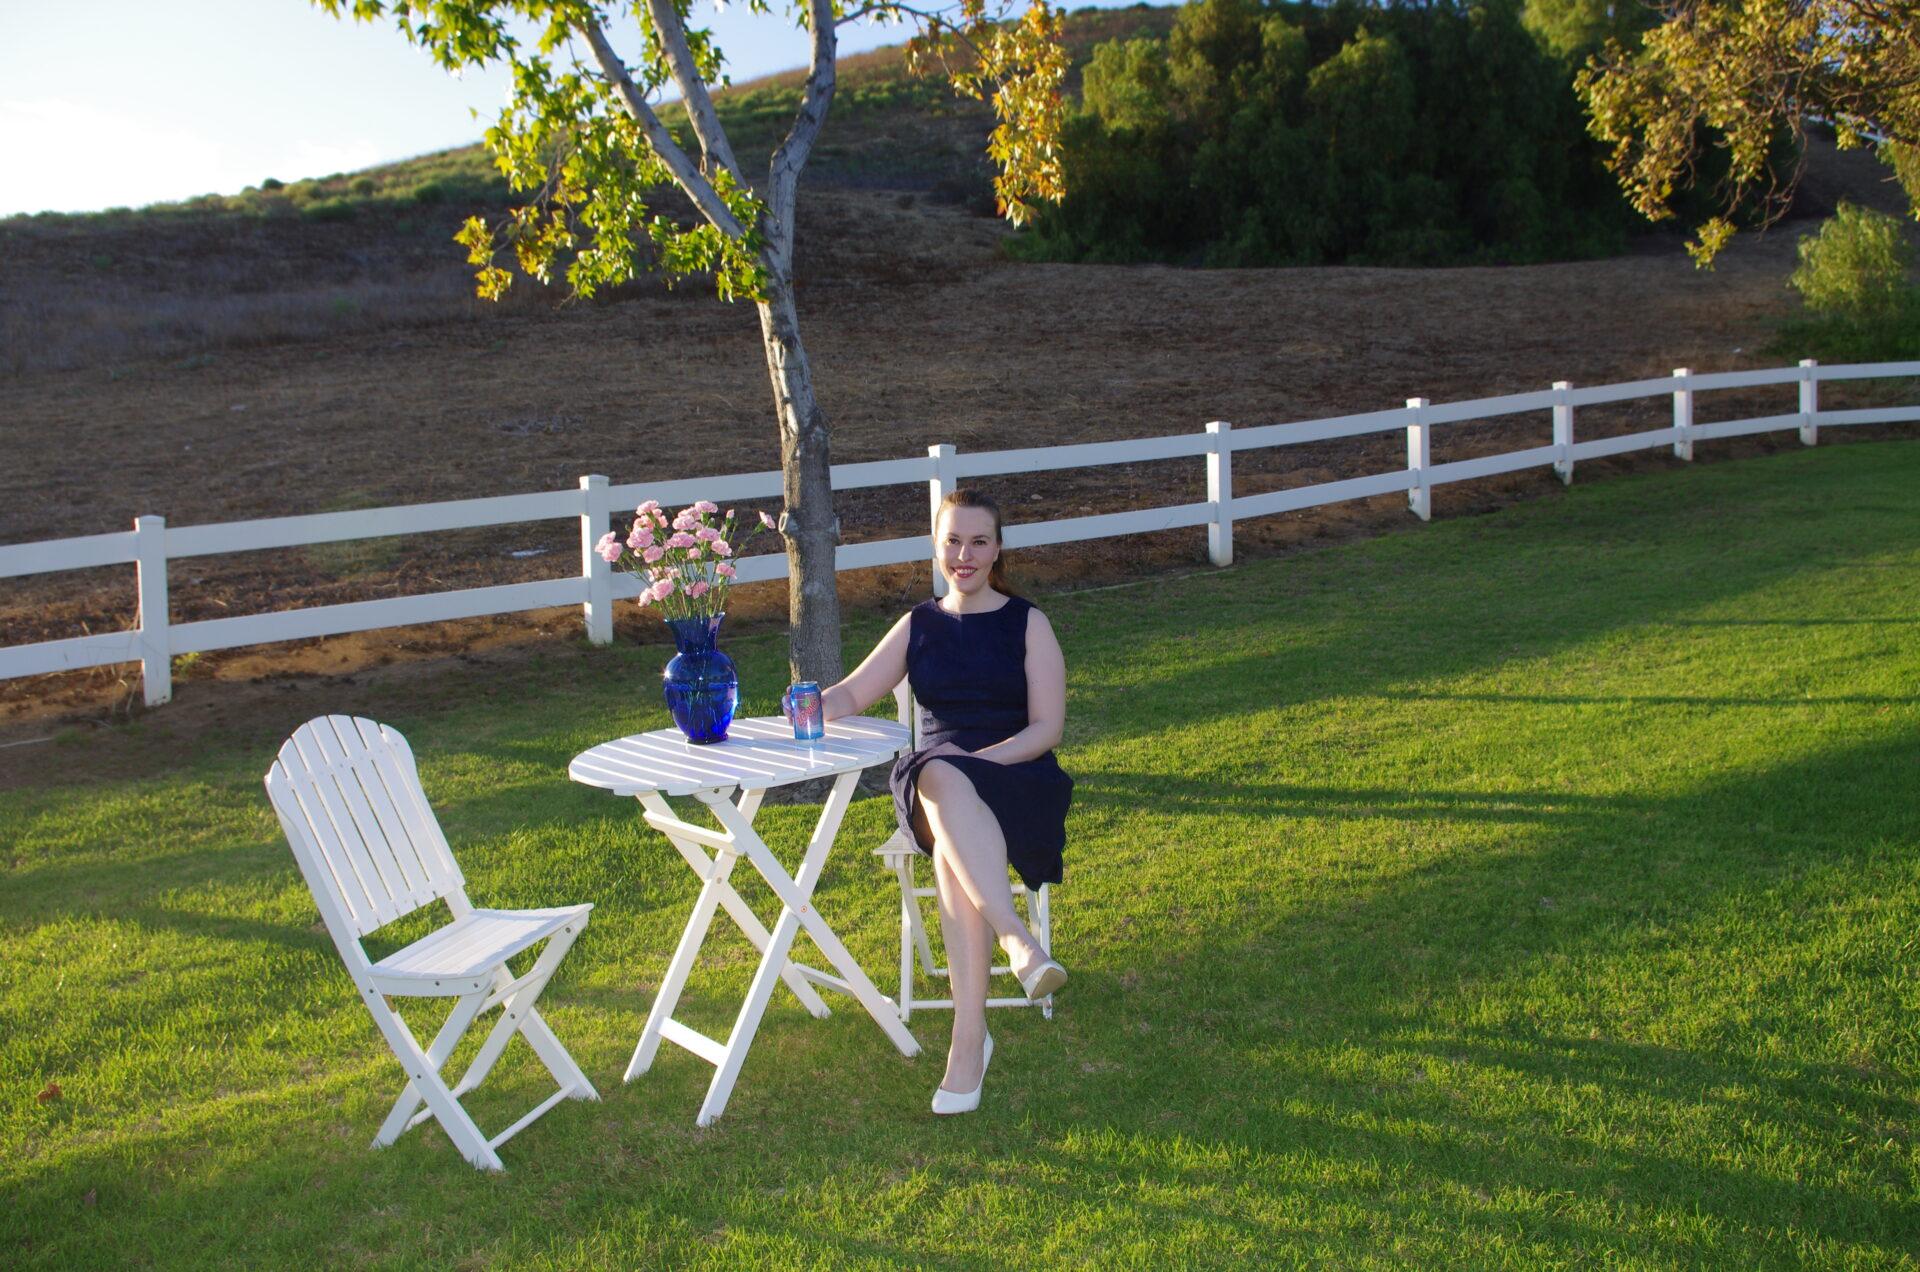 #ZeviaStyle, Eva Mendes Brocade Dress, New York and Company, BCBG White Heels